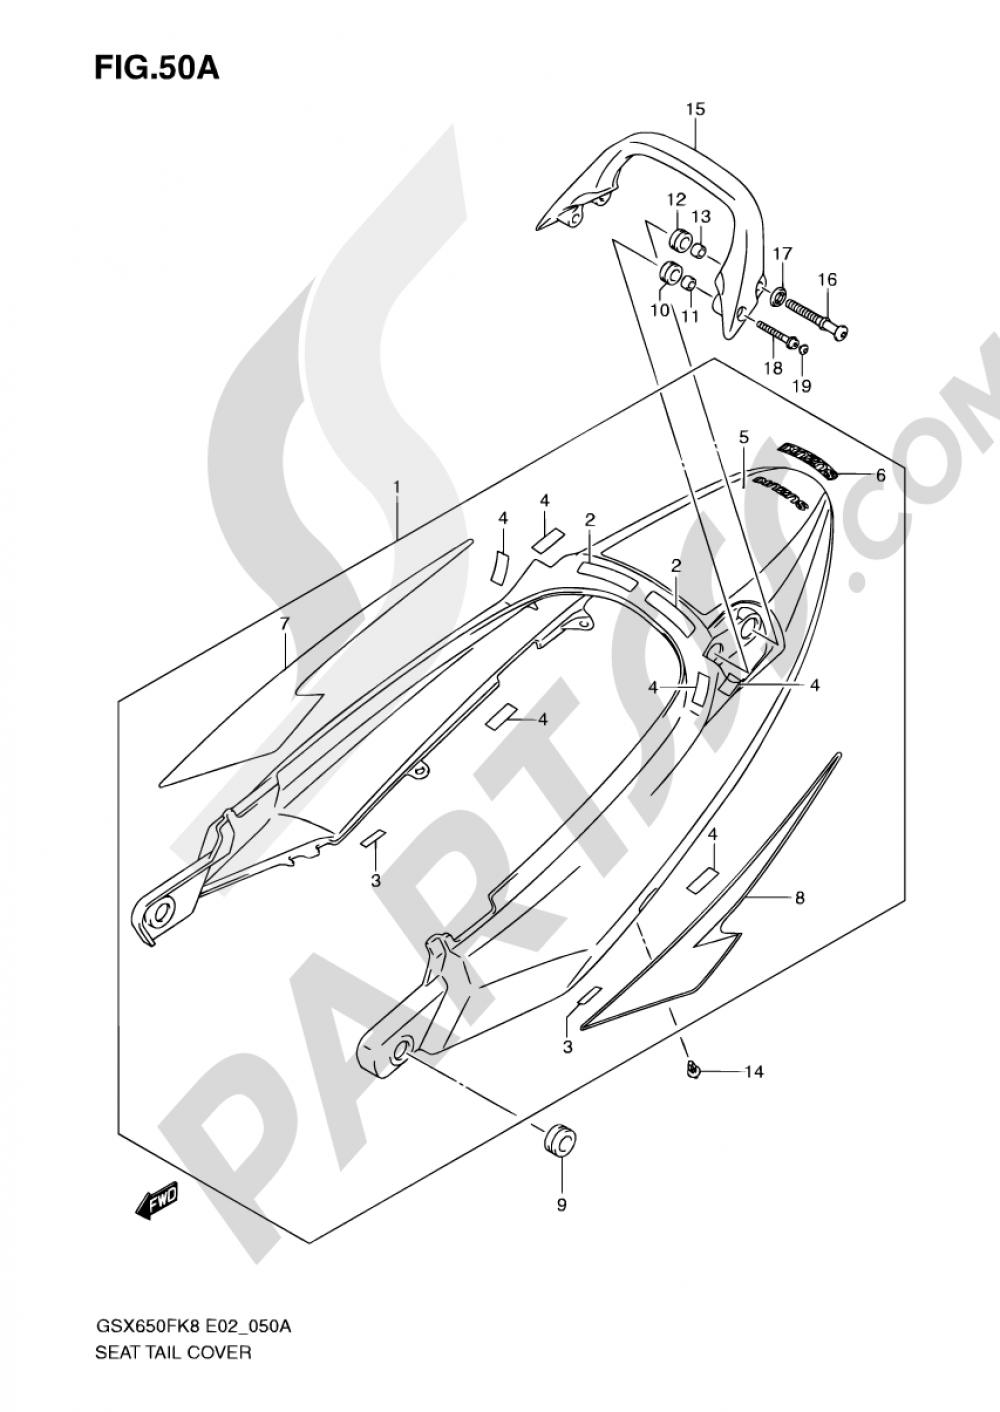 50A - SEAT TAIL COVER (MODEL K9) Suzuki GSX650FA 2009